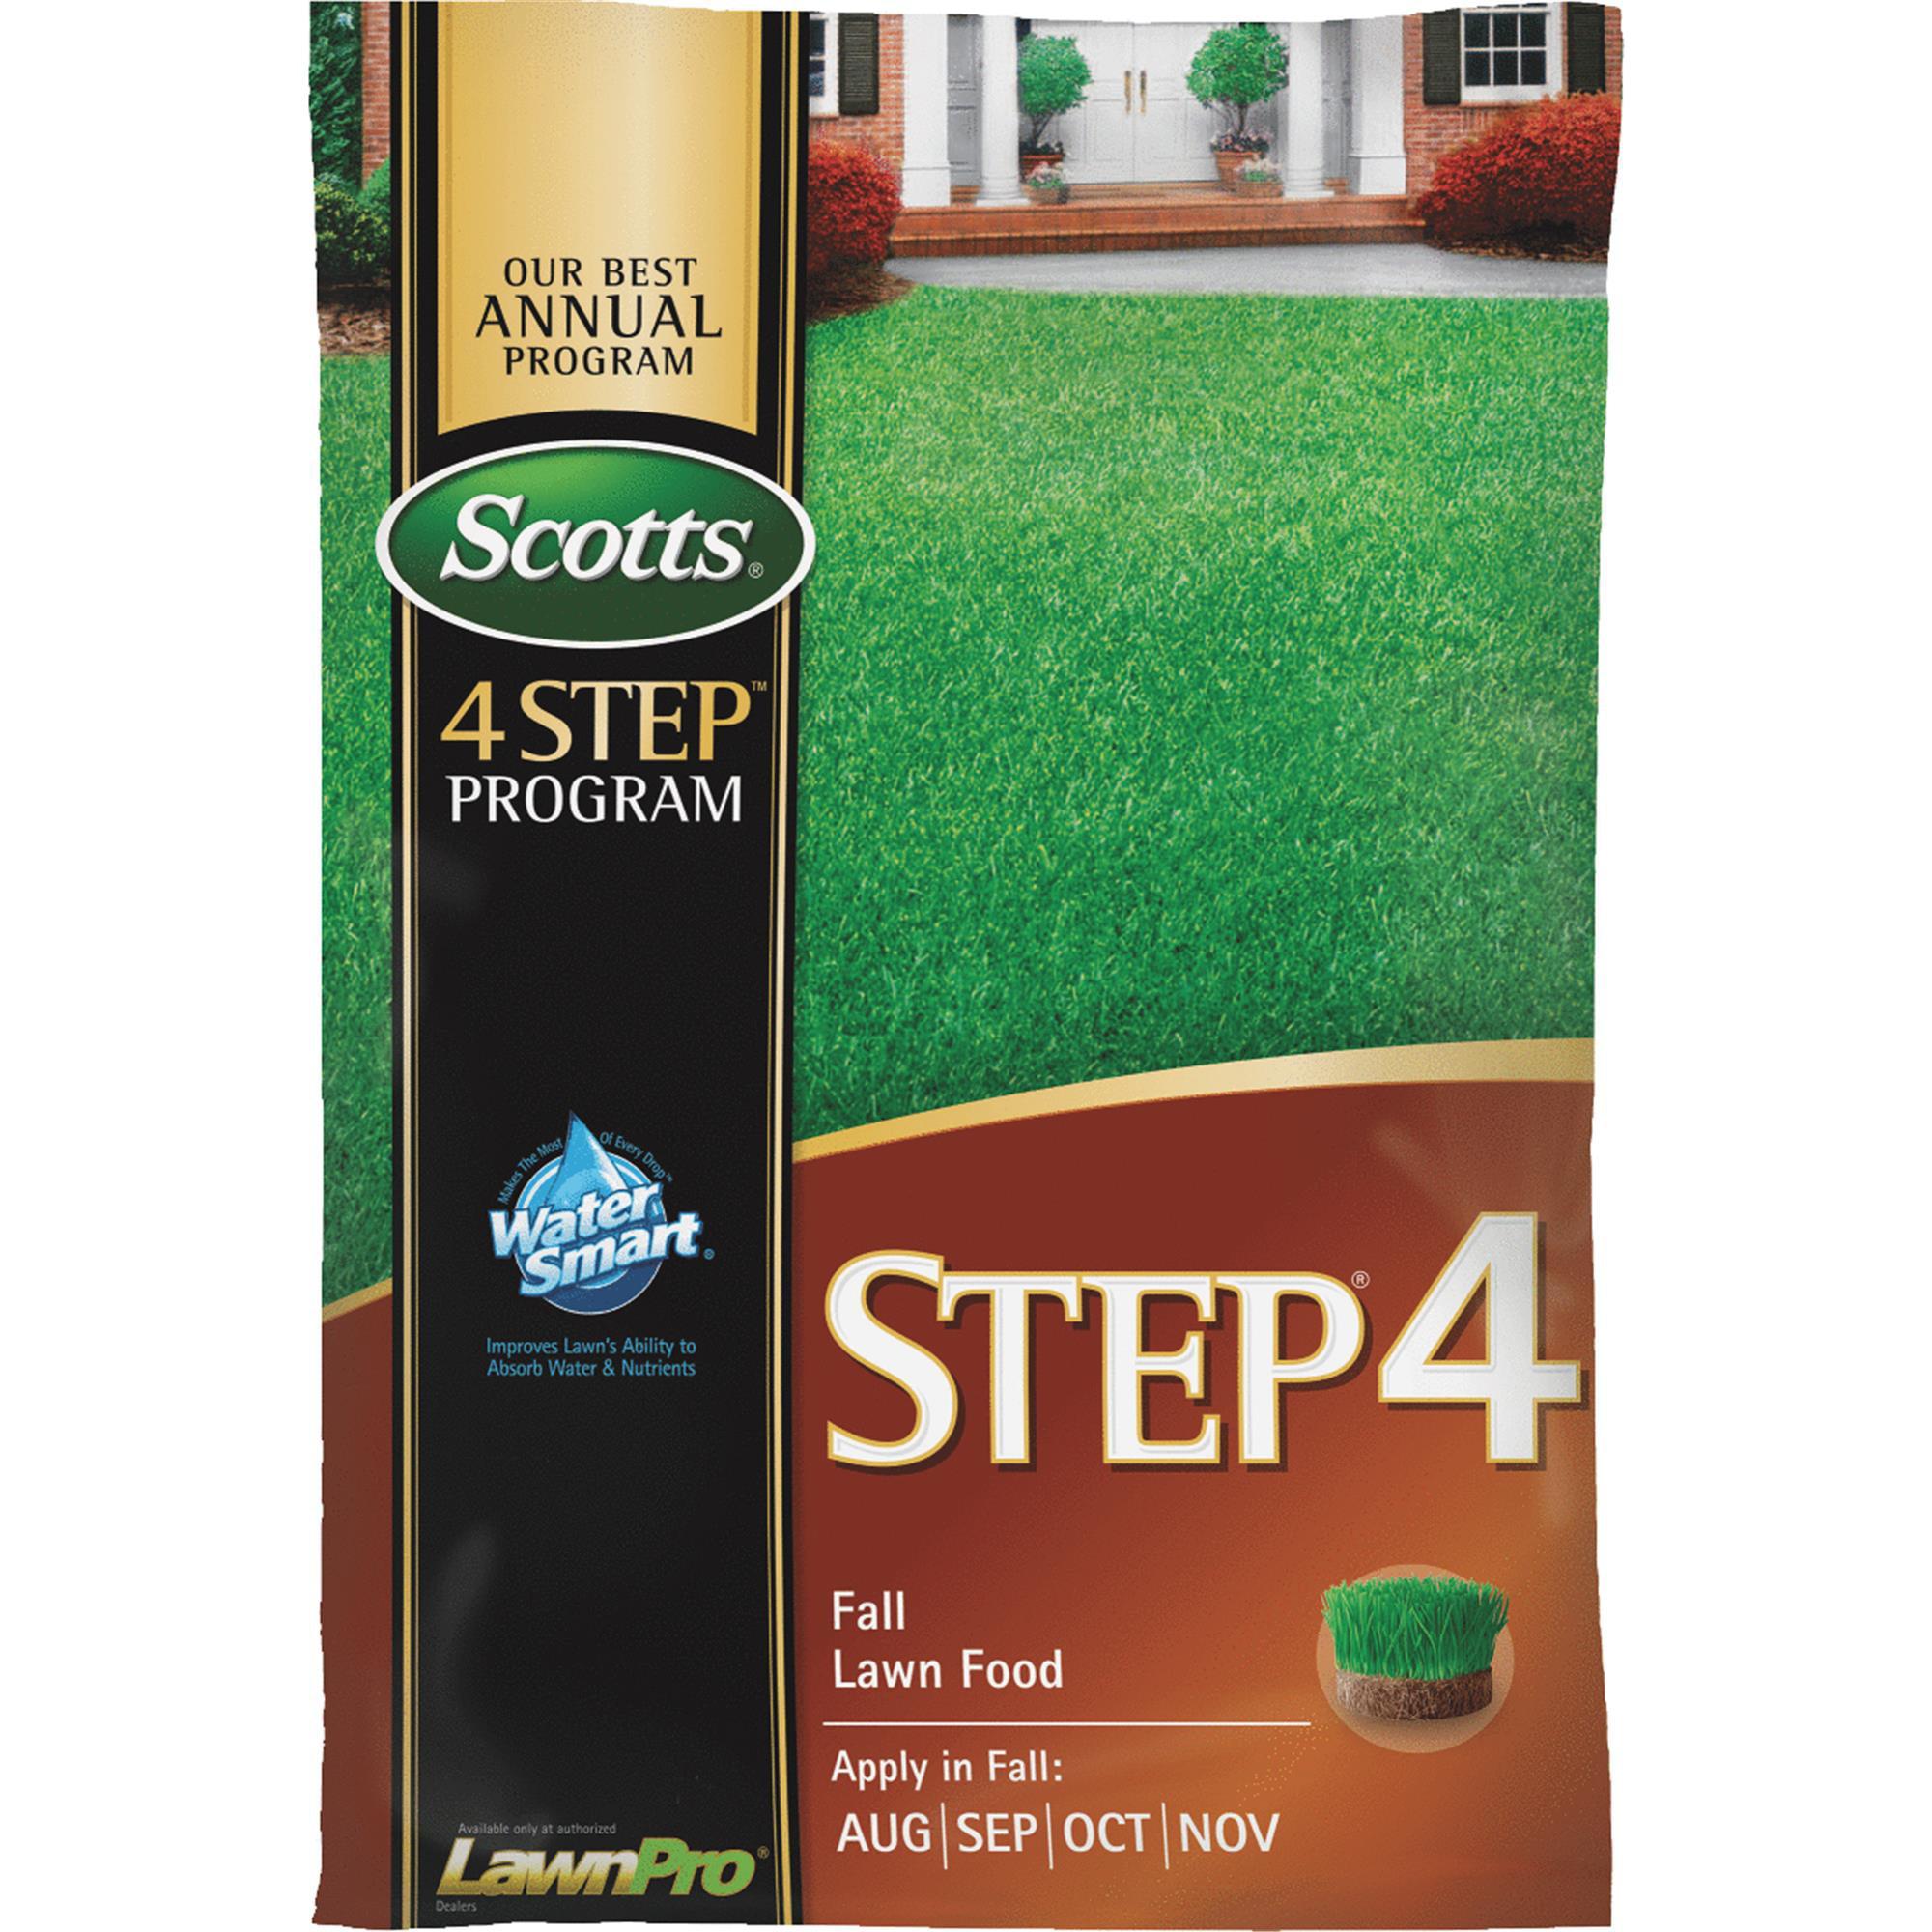 scotts 4-step program step 4 fall lawn fertilizer - walmart